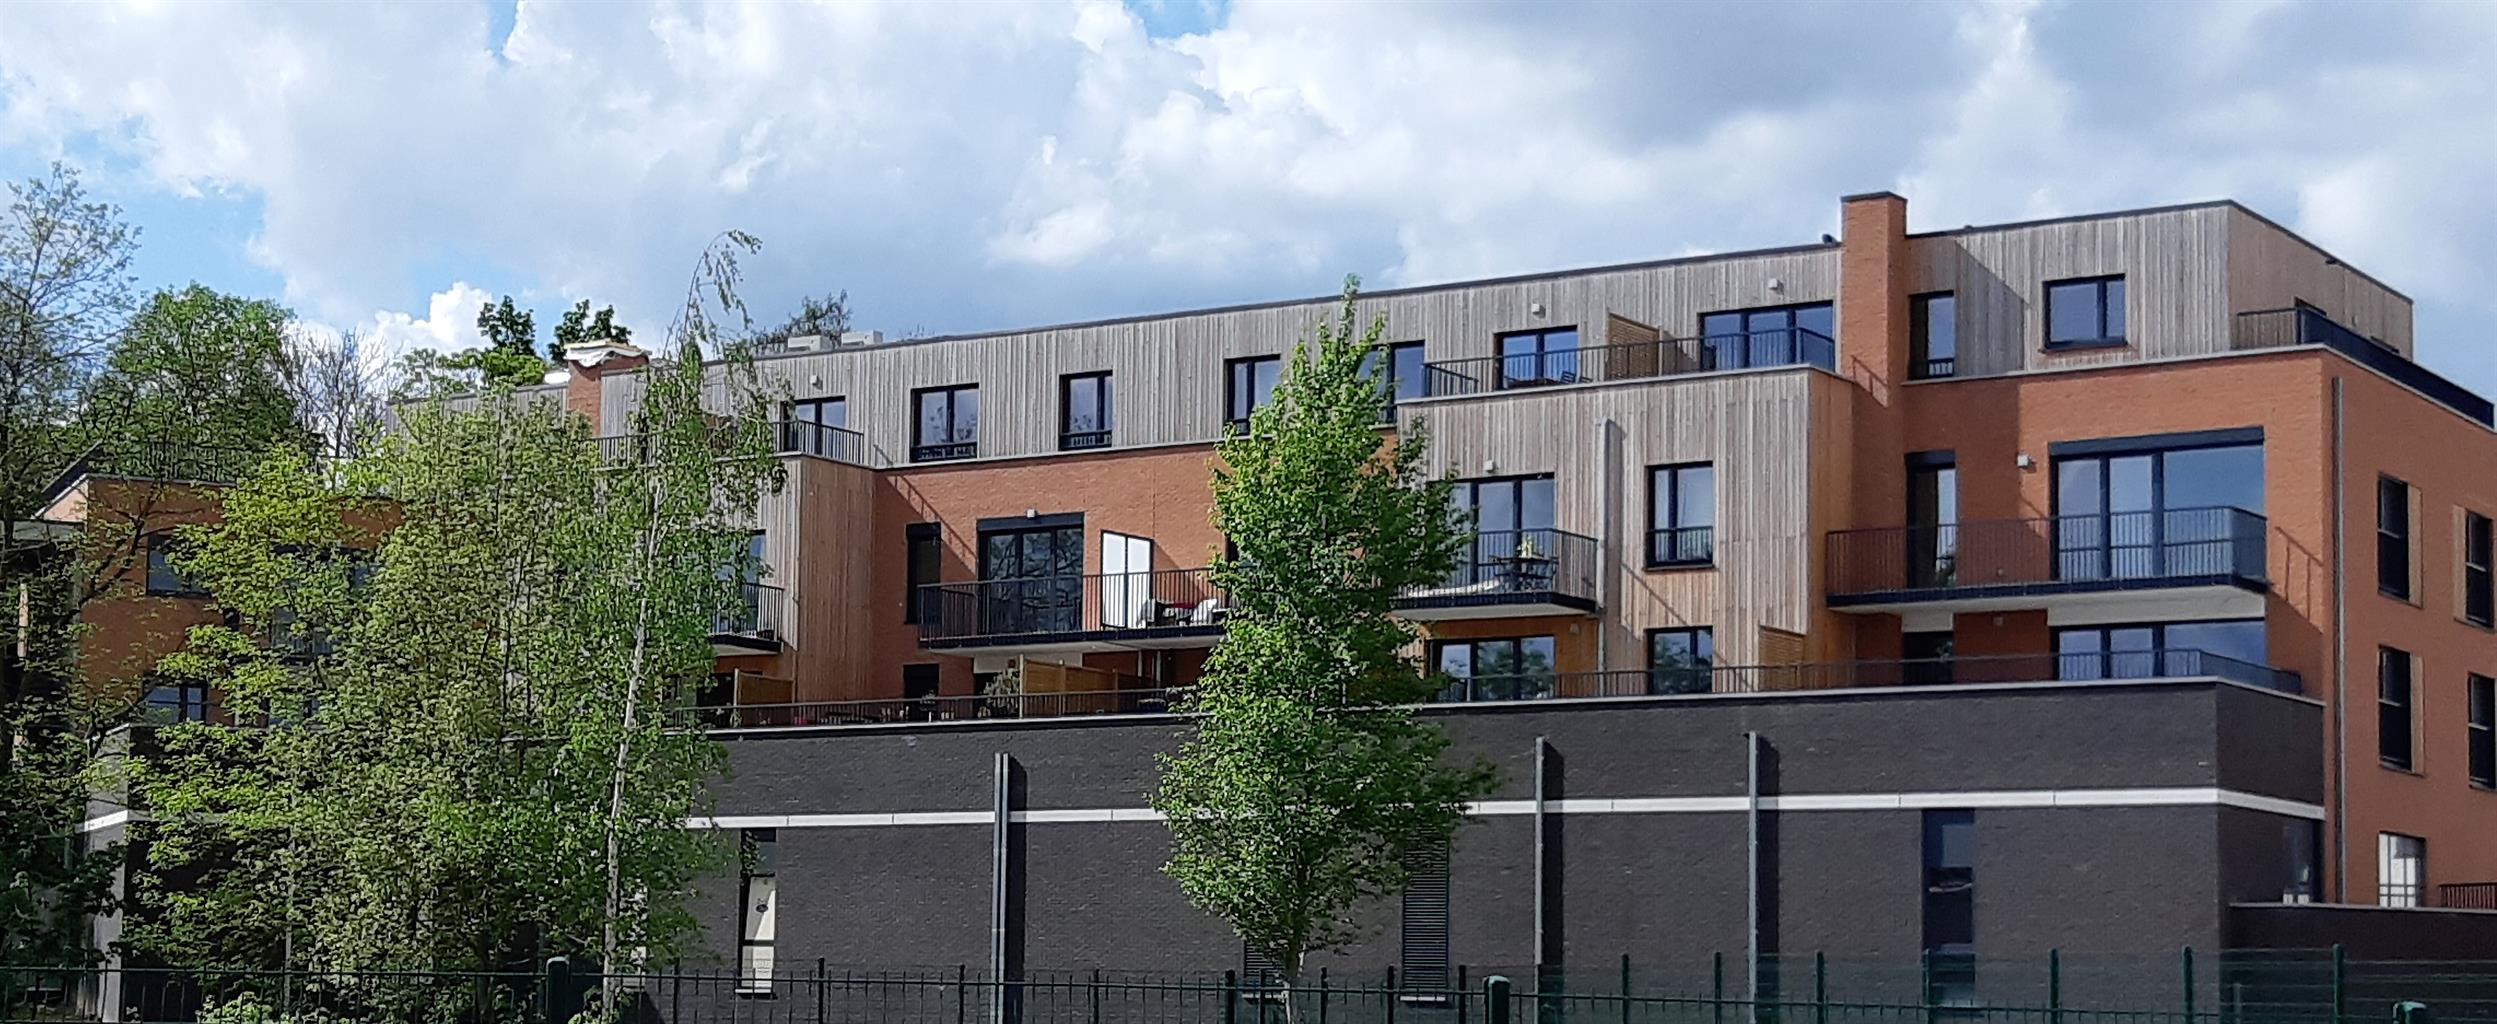 Appartement - Court-Saint-Etienne - #3468376-1